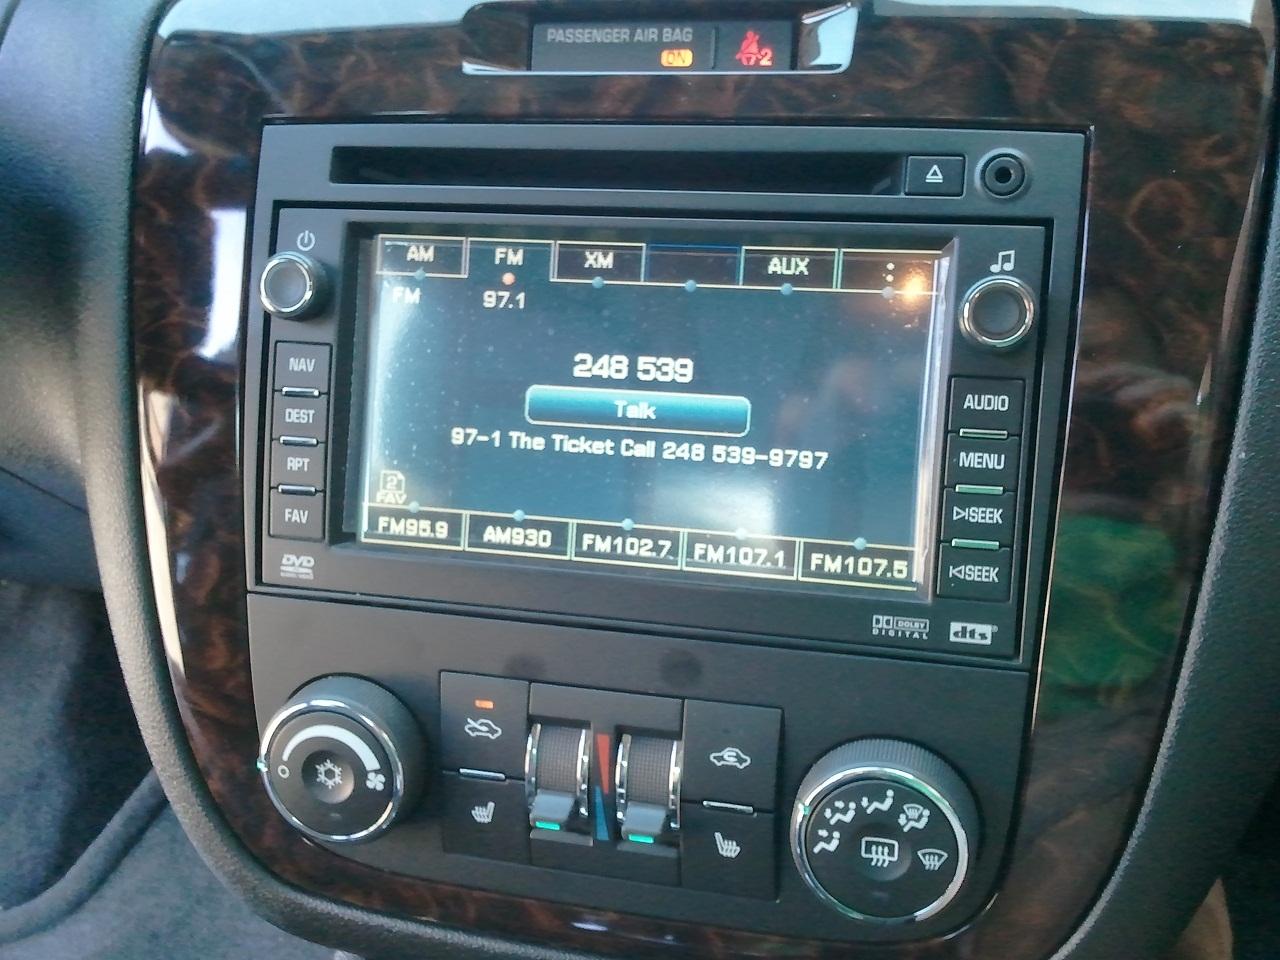 2012 Impala Backup Camera - Chevy Impala Forums